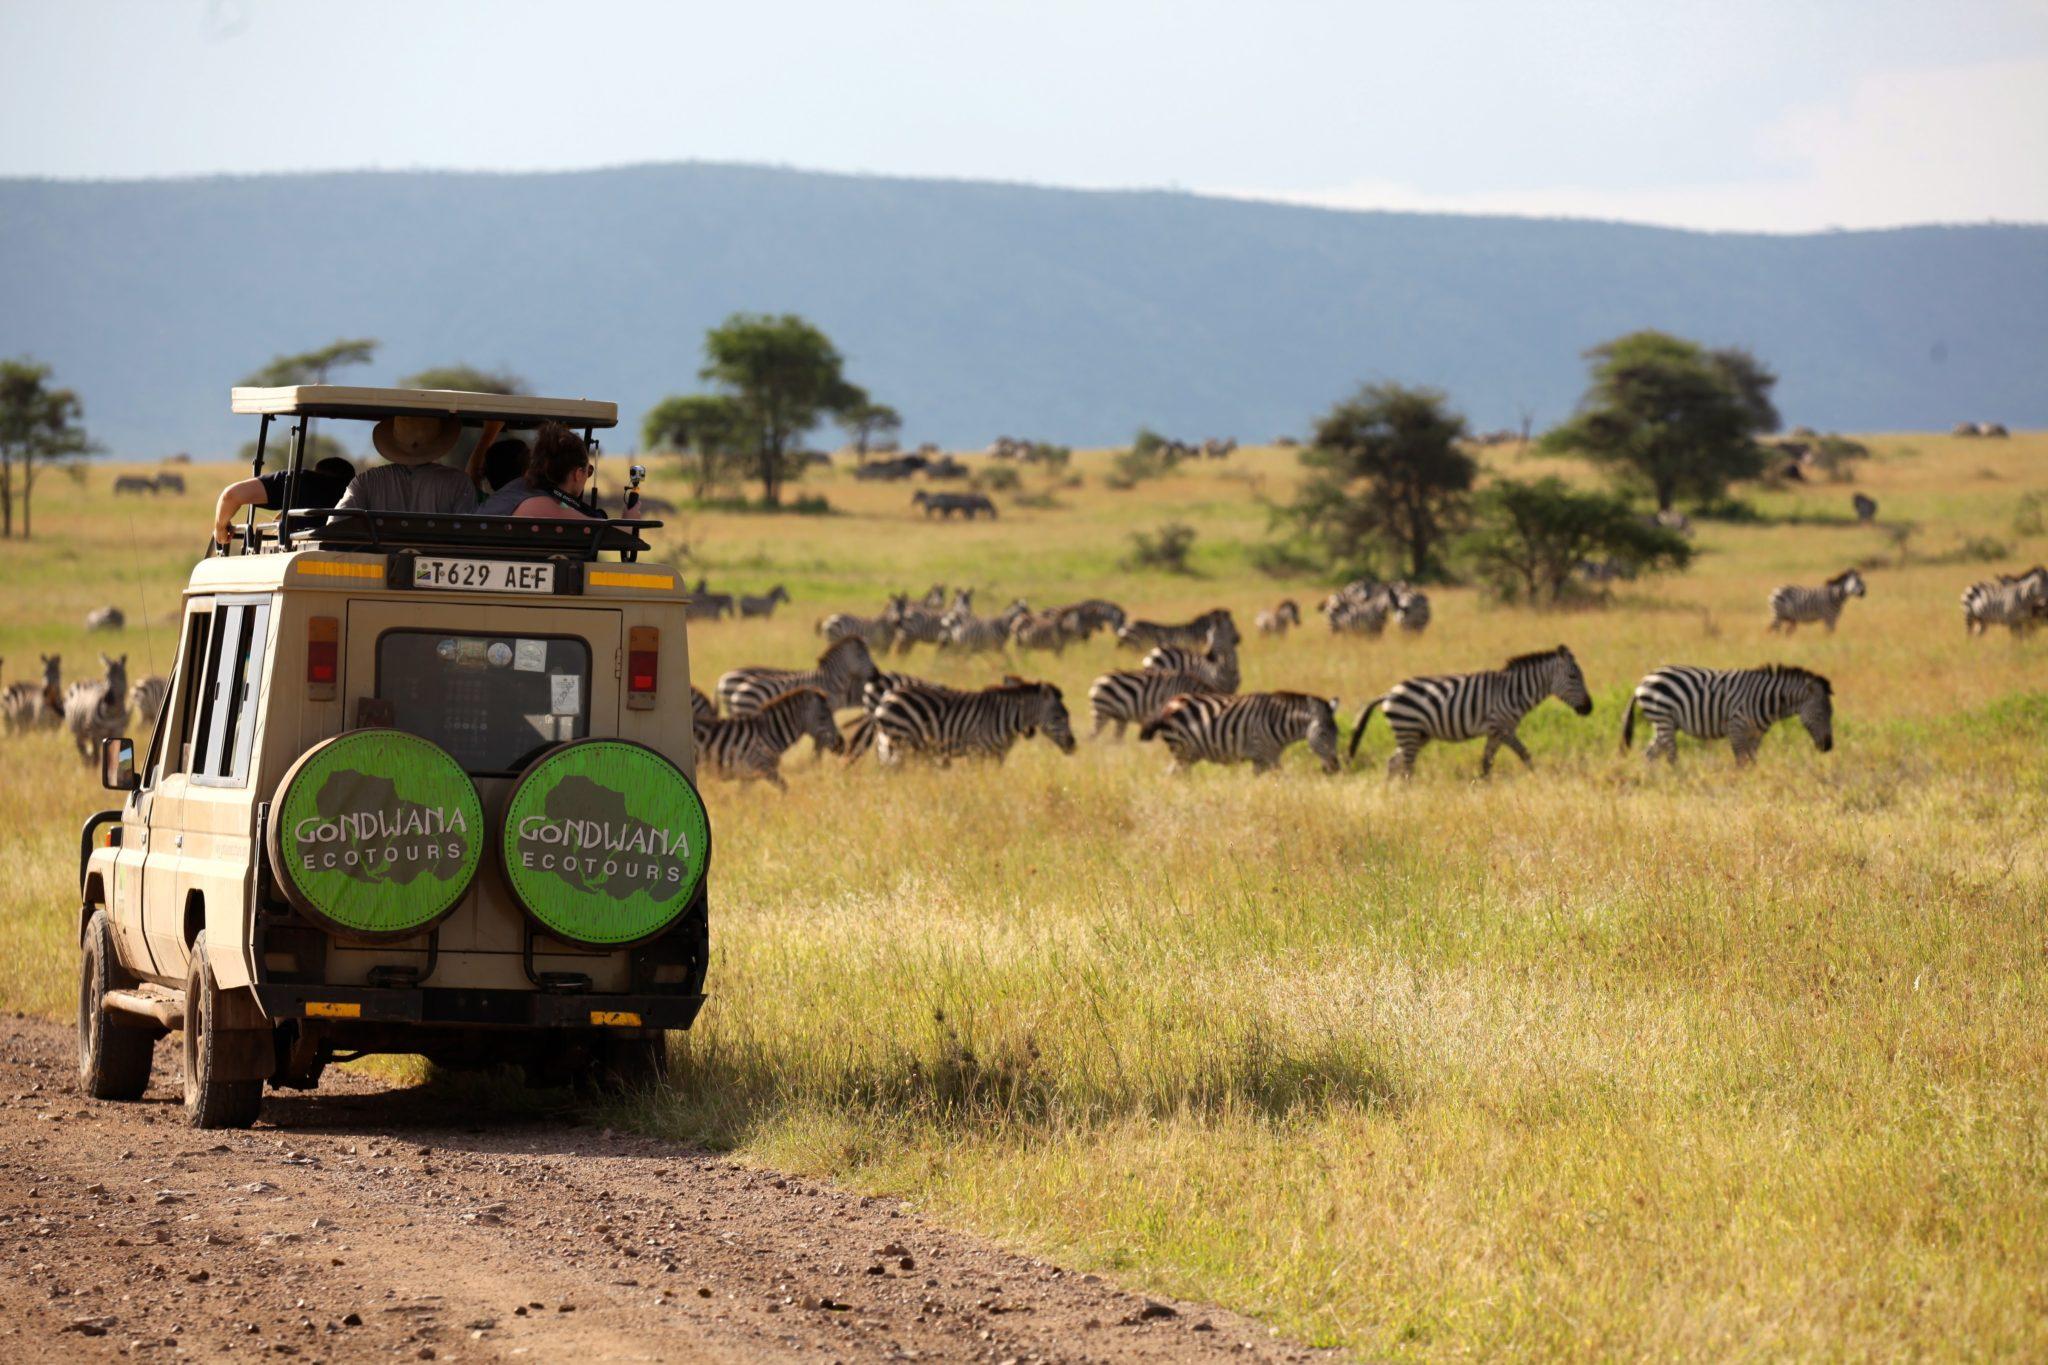 Game drive views zebras in serengeti